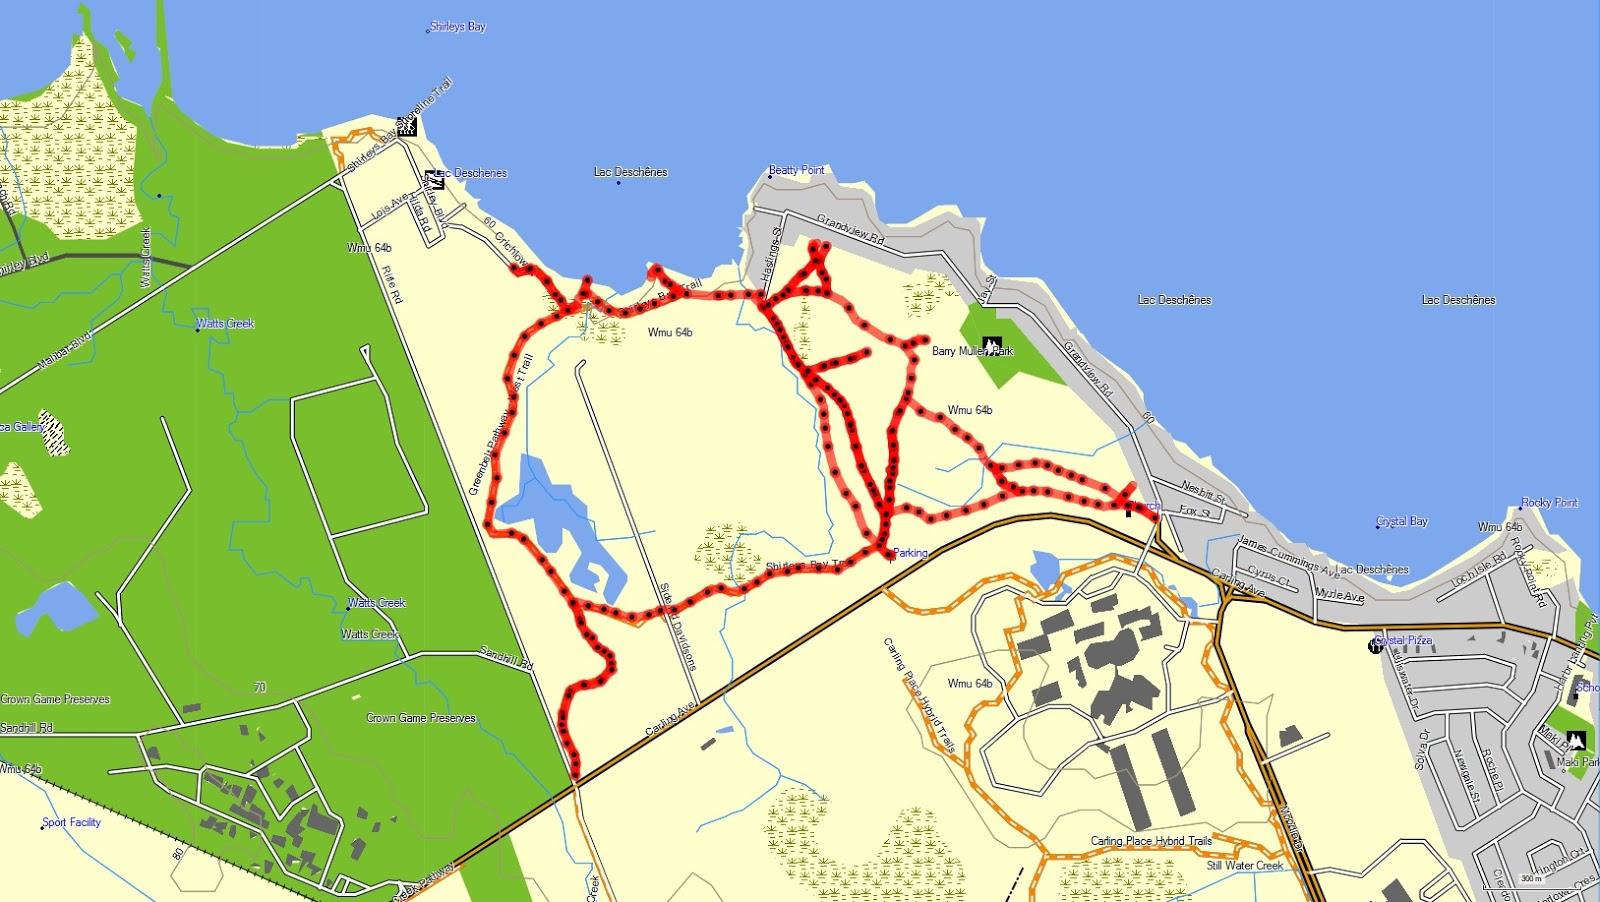 Richard's GPS Trail Maps: Trail 10 Trail System